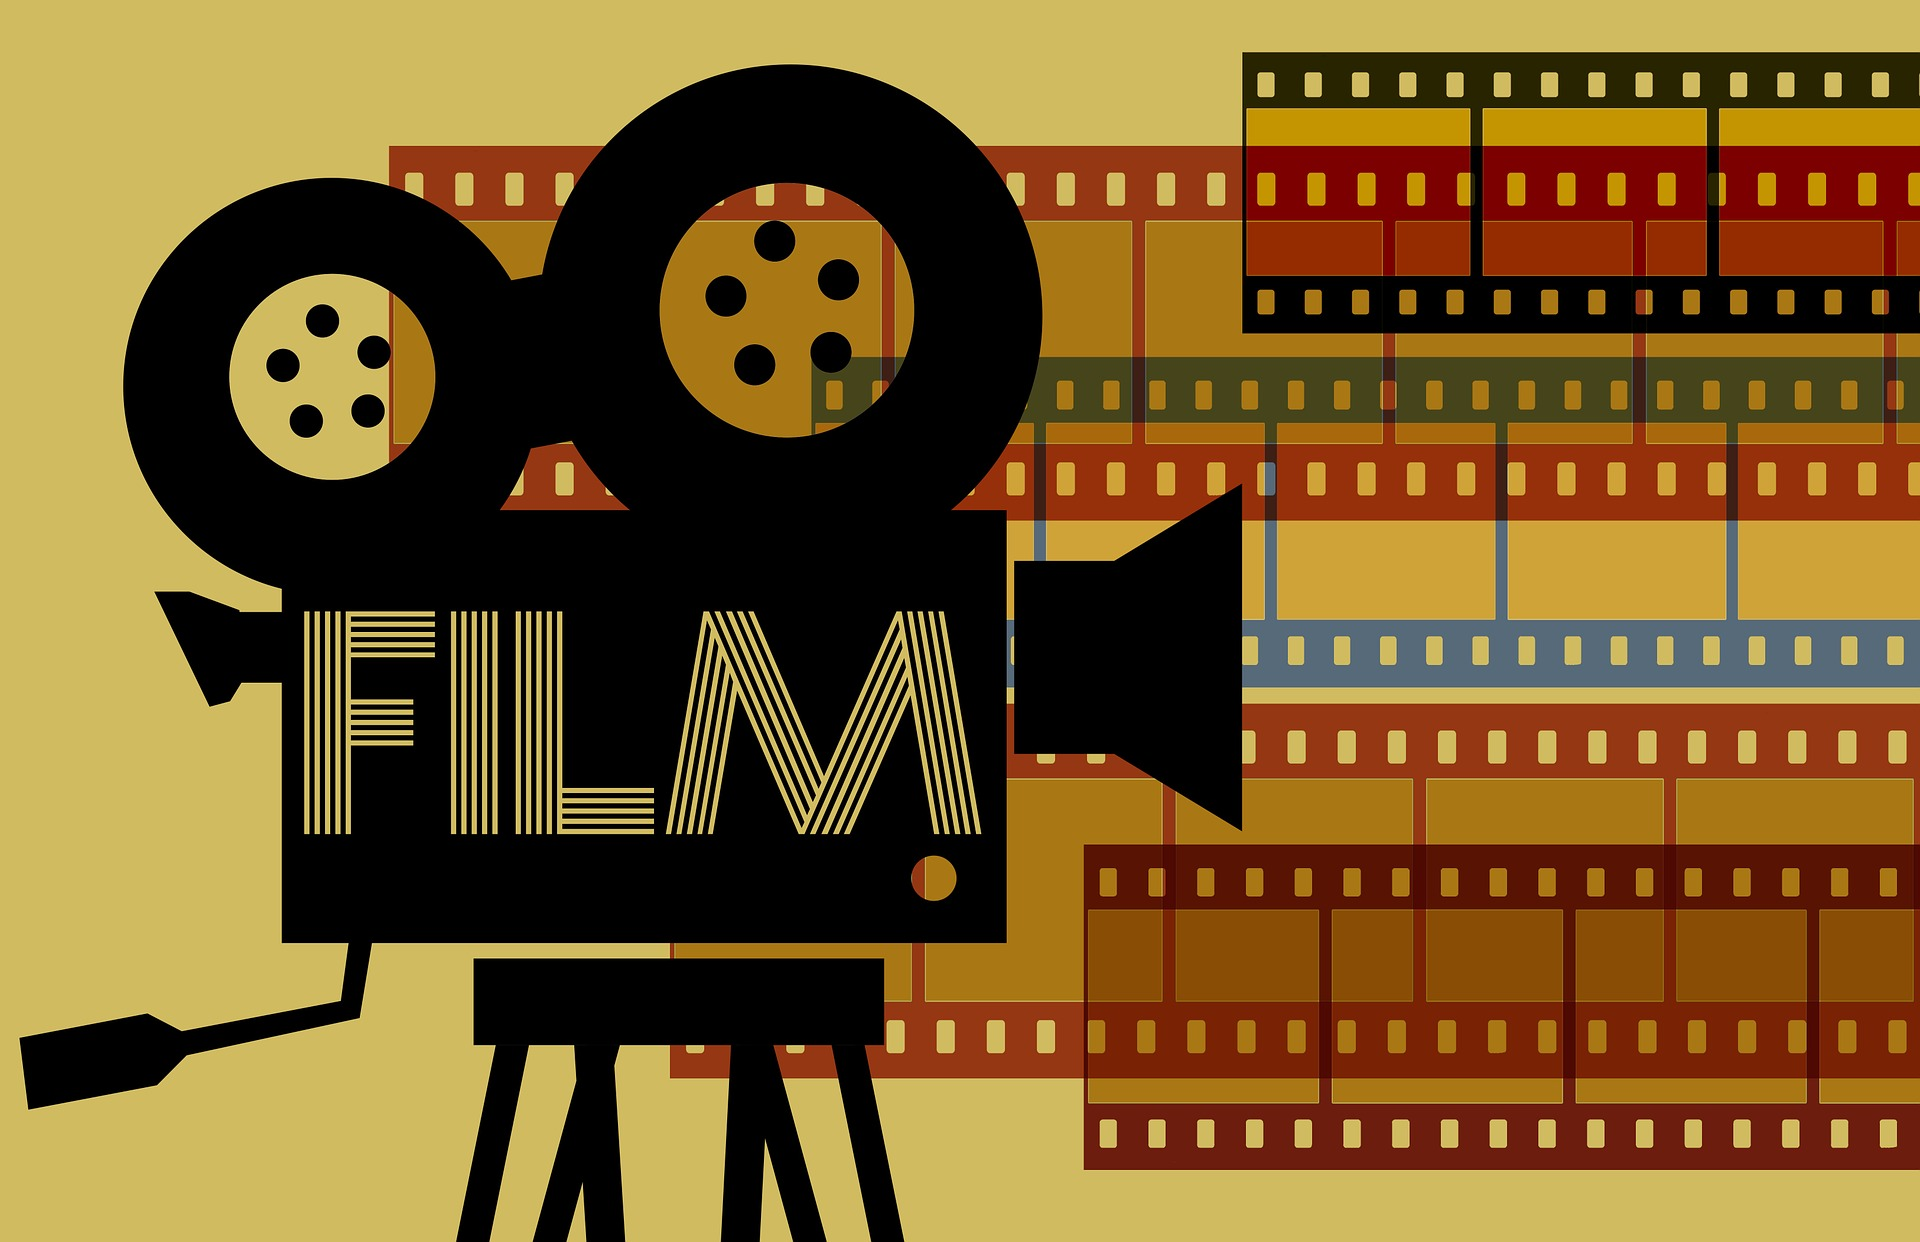 film-1155439_1920.jpg